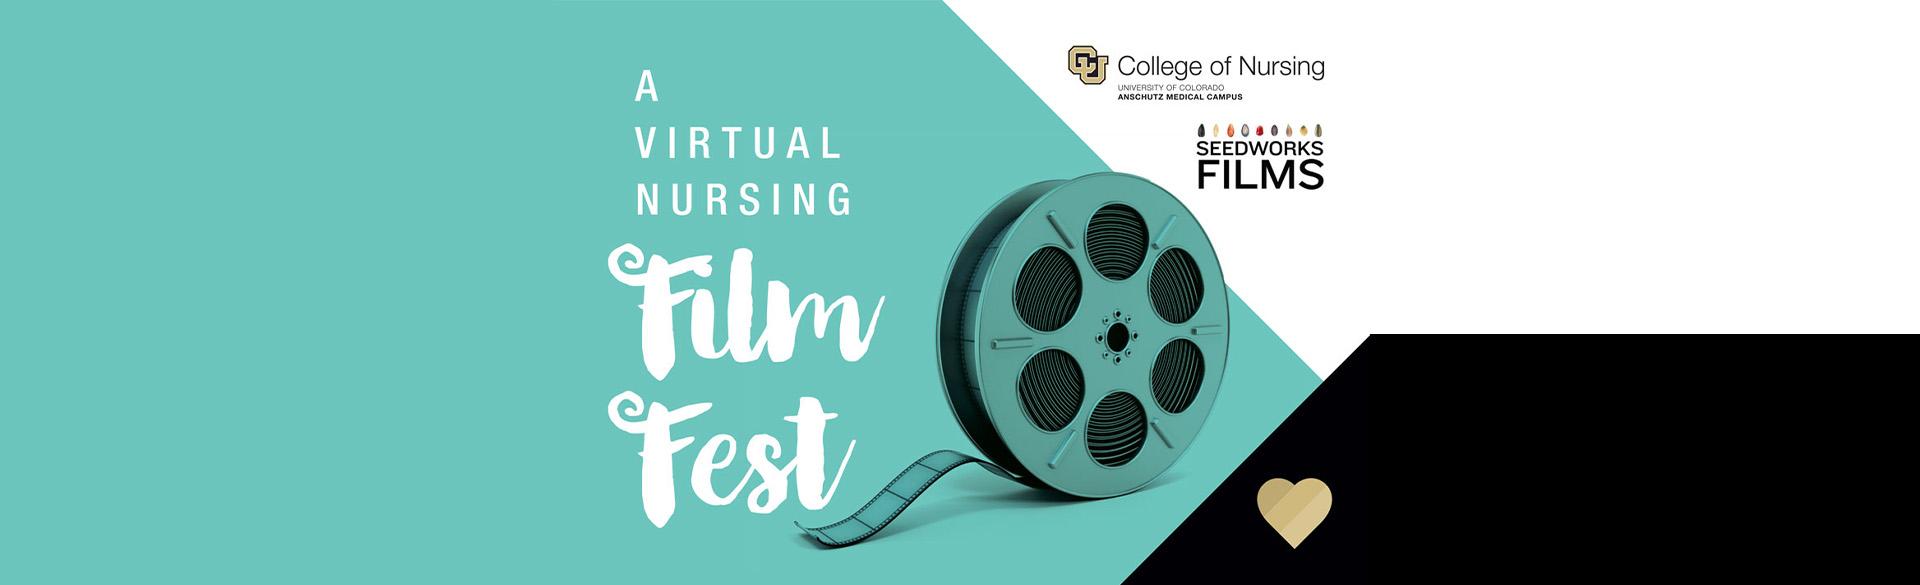 CU Nursing and Seedworks Films presents a Virtual Film Festival